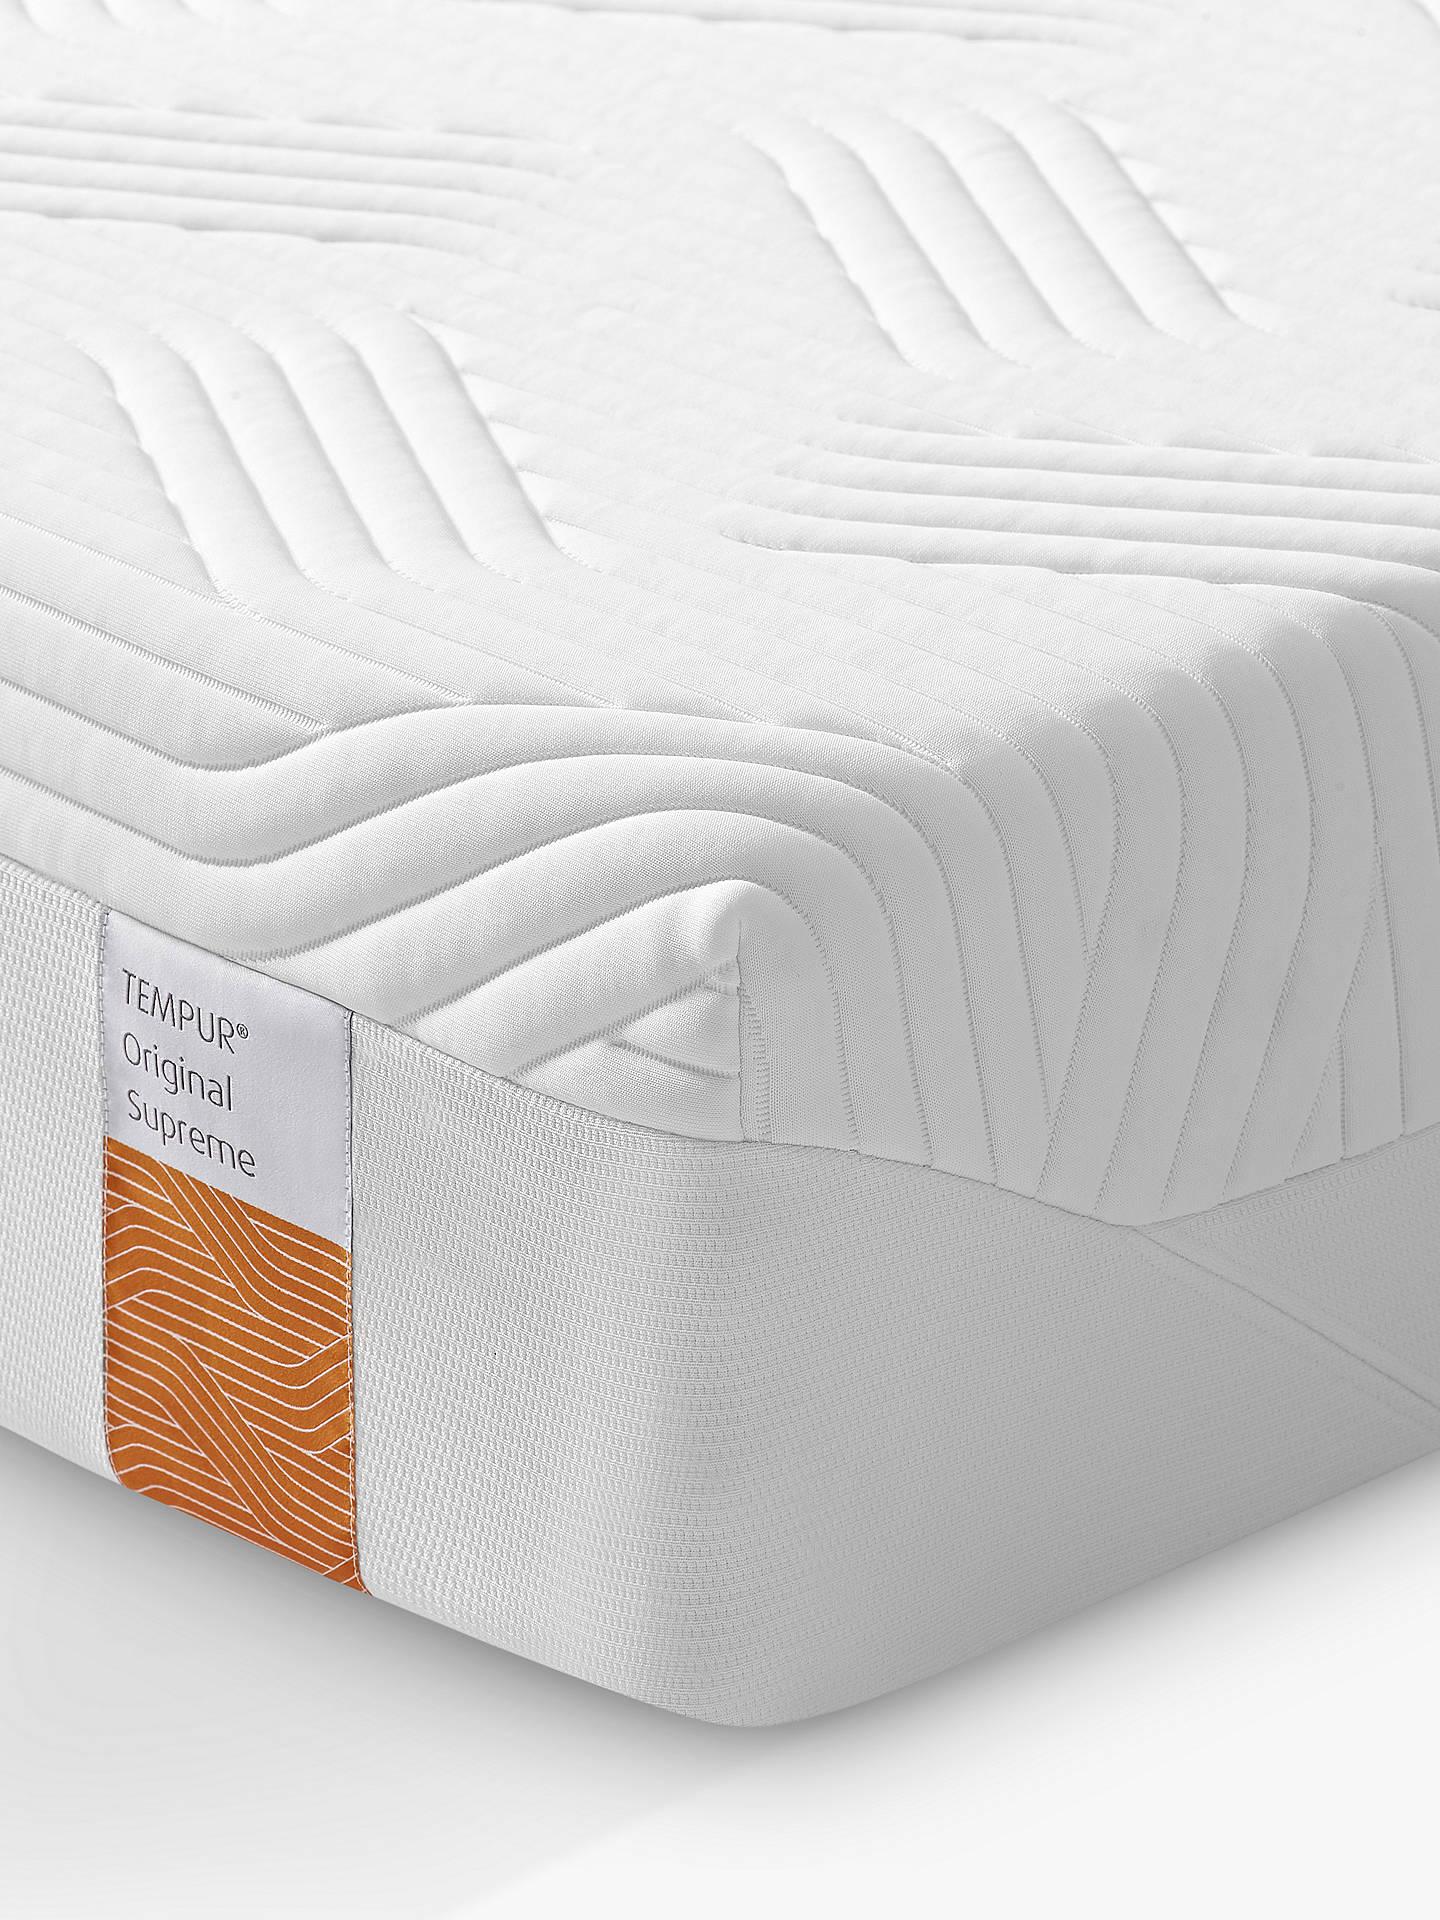 size 40 25f4c f1646 Tempur Original Supreme Memory Foam Mattress, Firm Tension, Super King Size